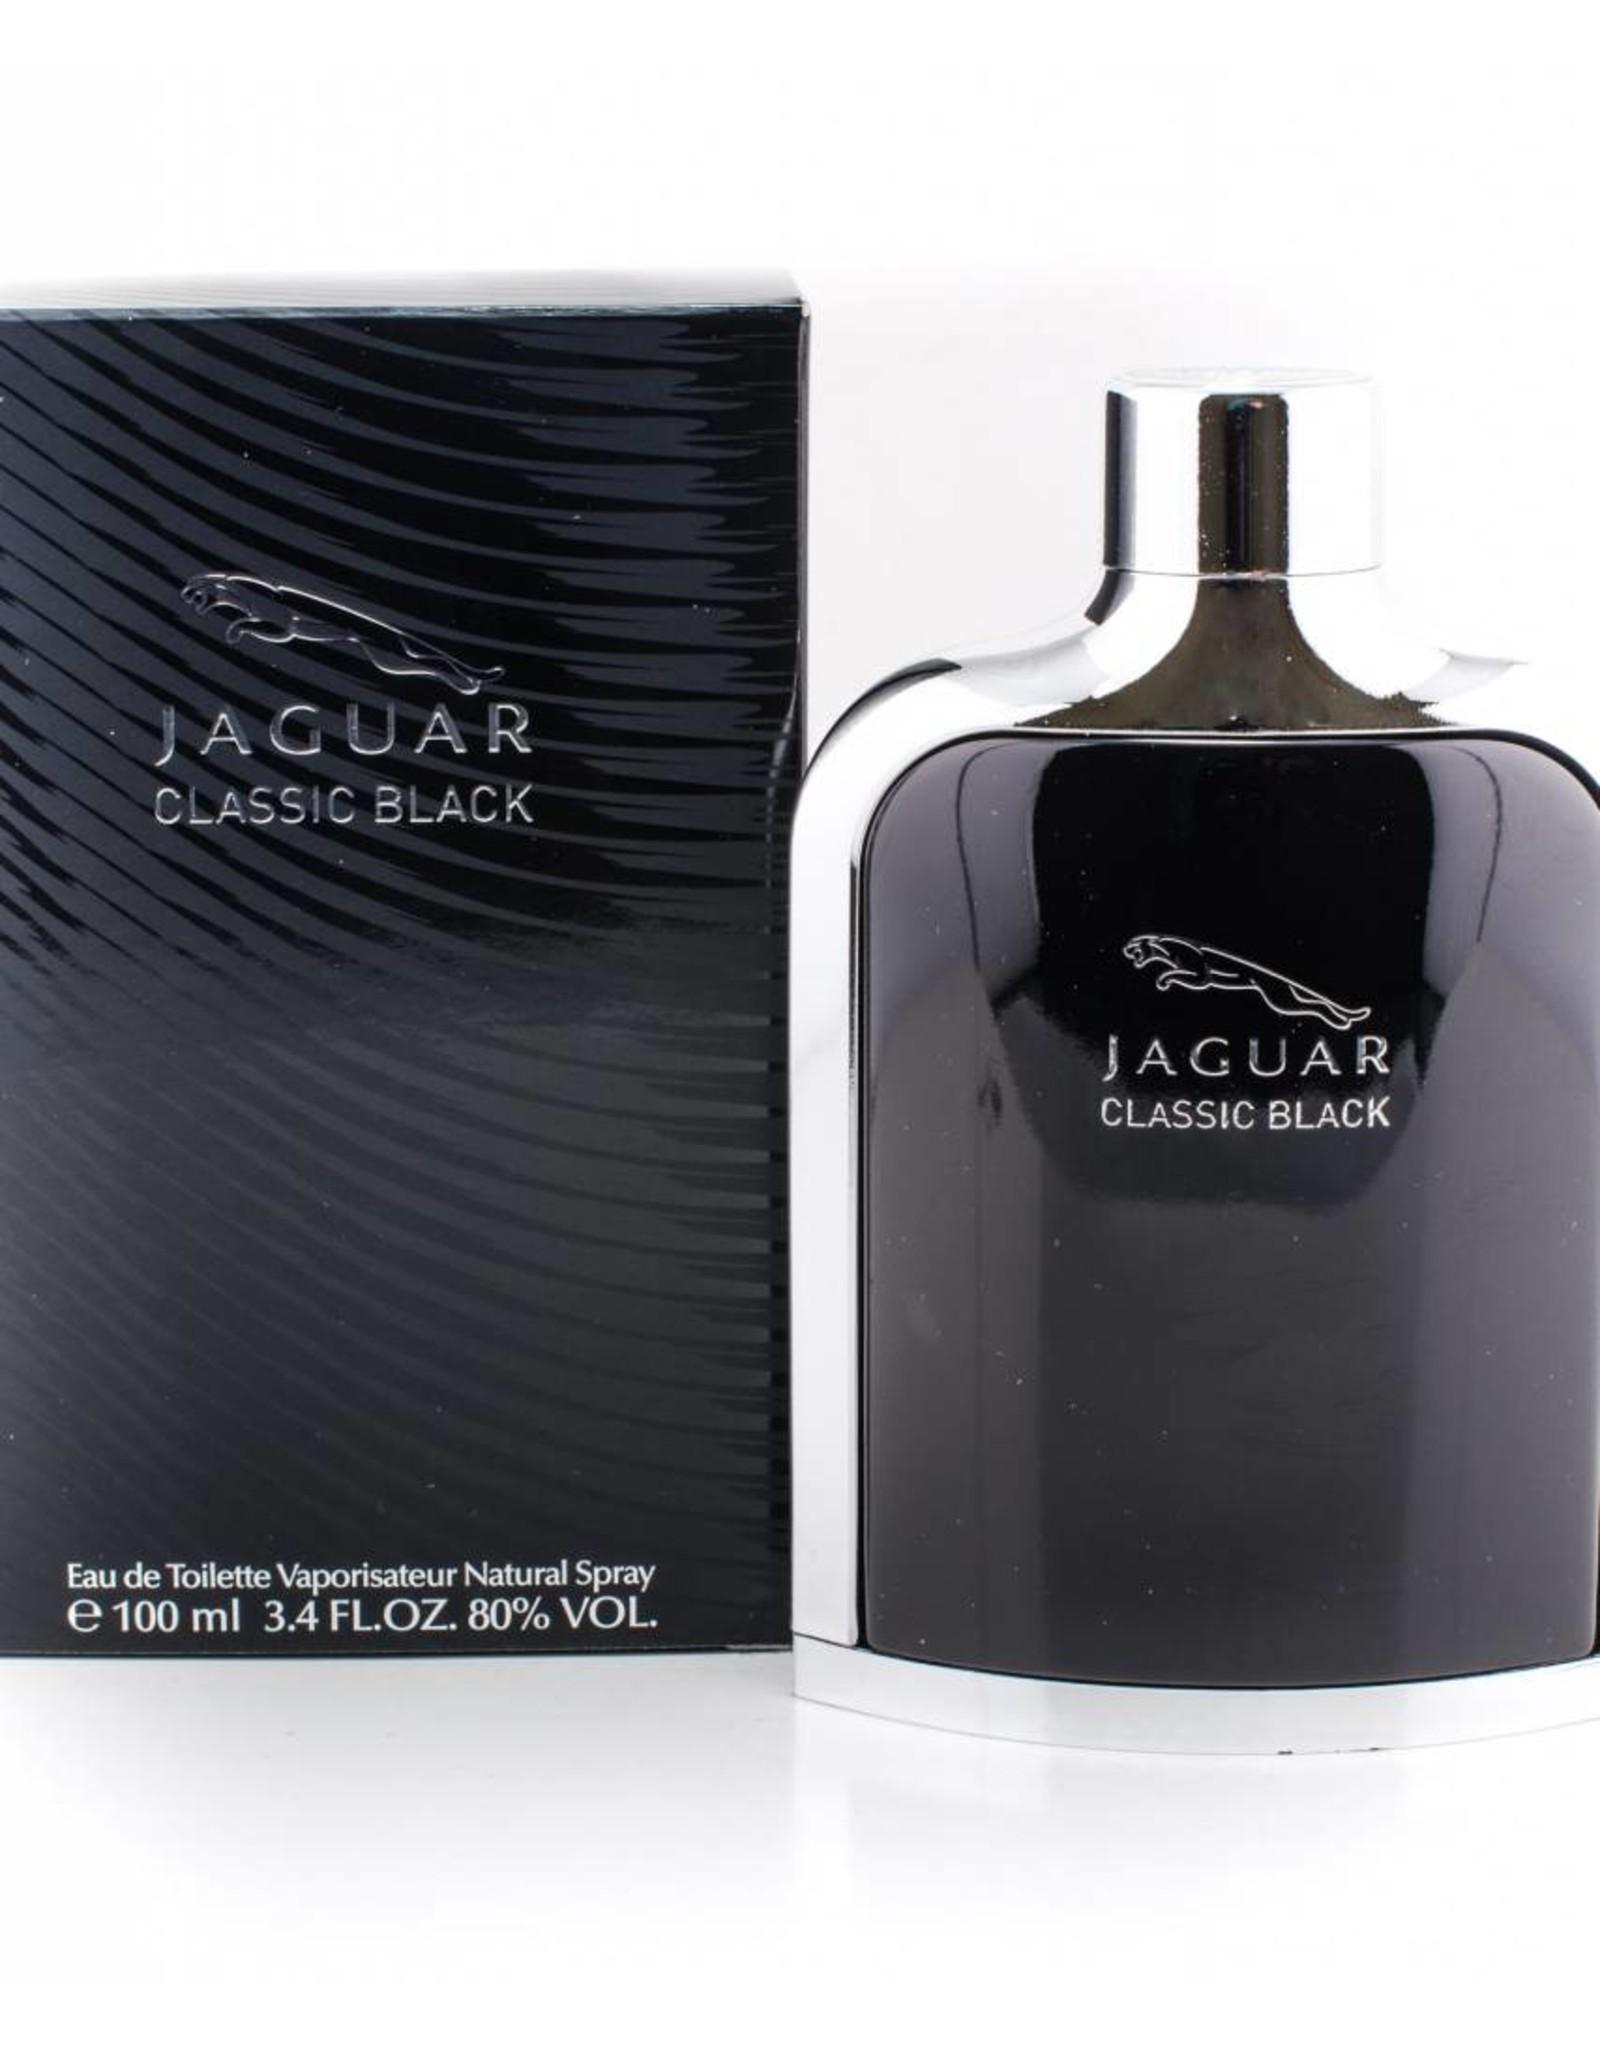 JAGUAR JAGUAR CLASSIC BLACK